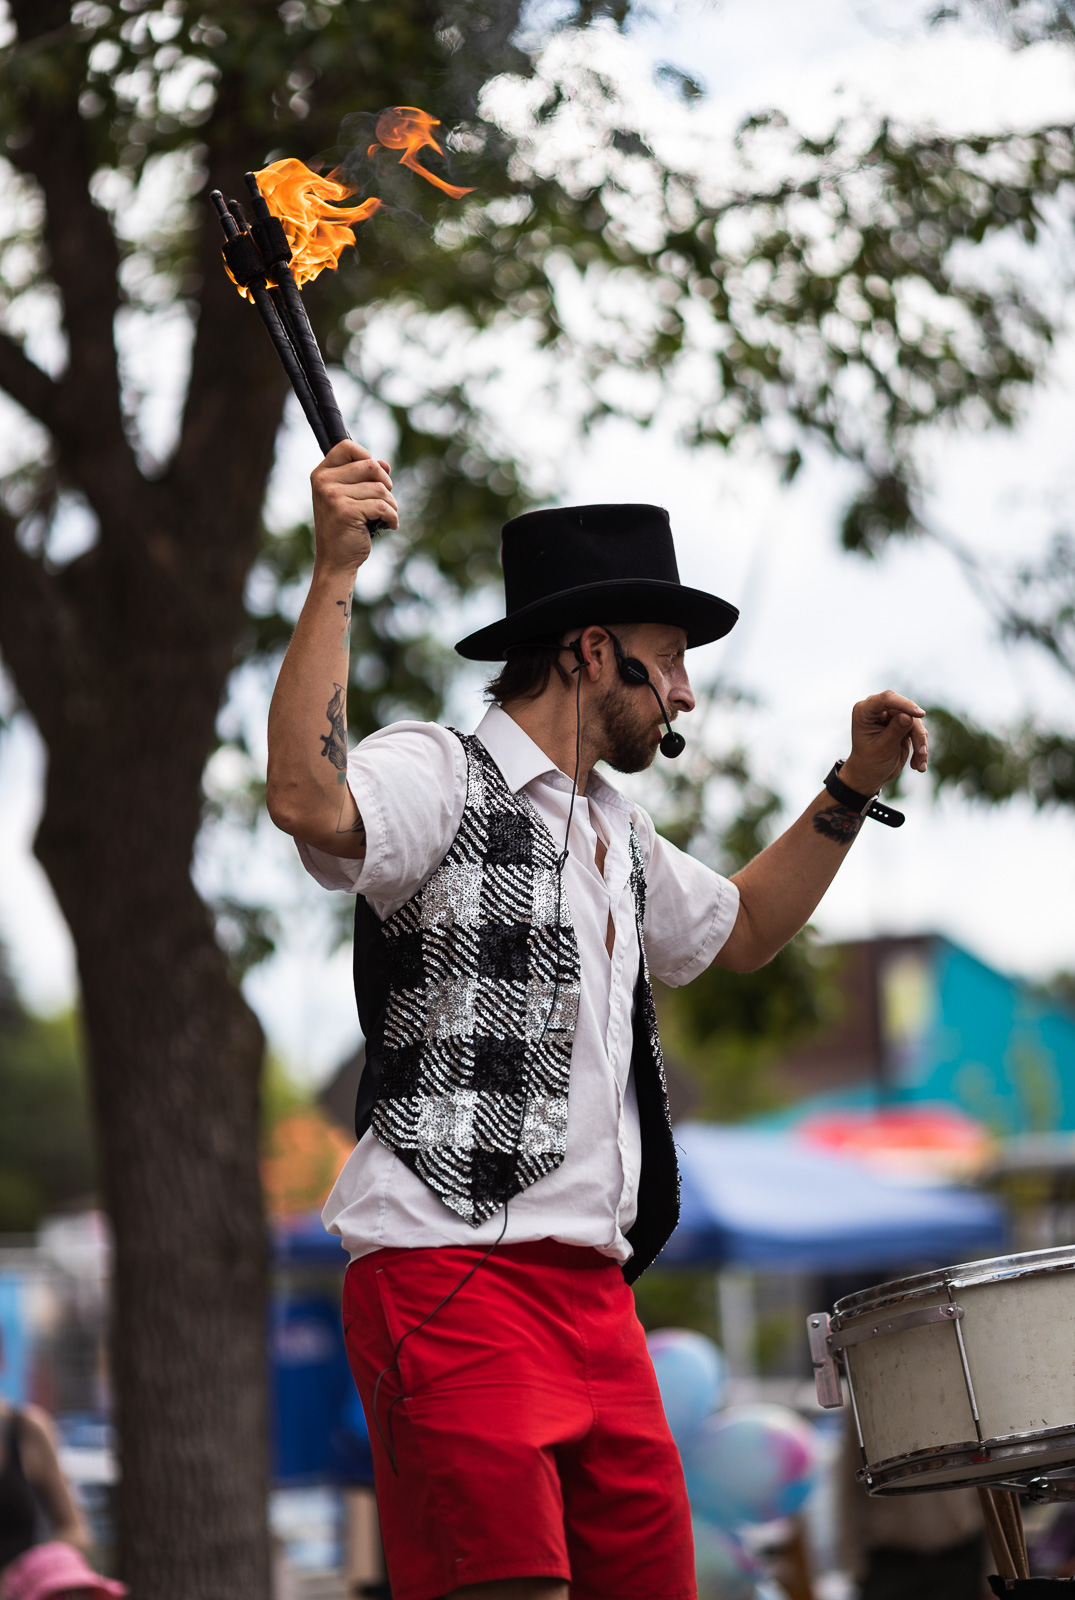 7th-annual-buskers-festival-blog-14.jpg